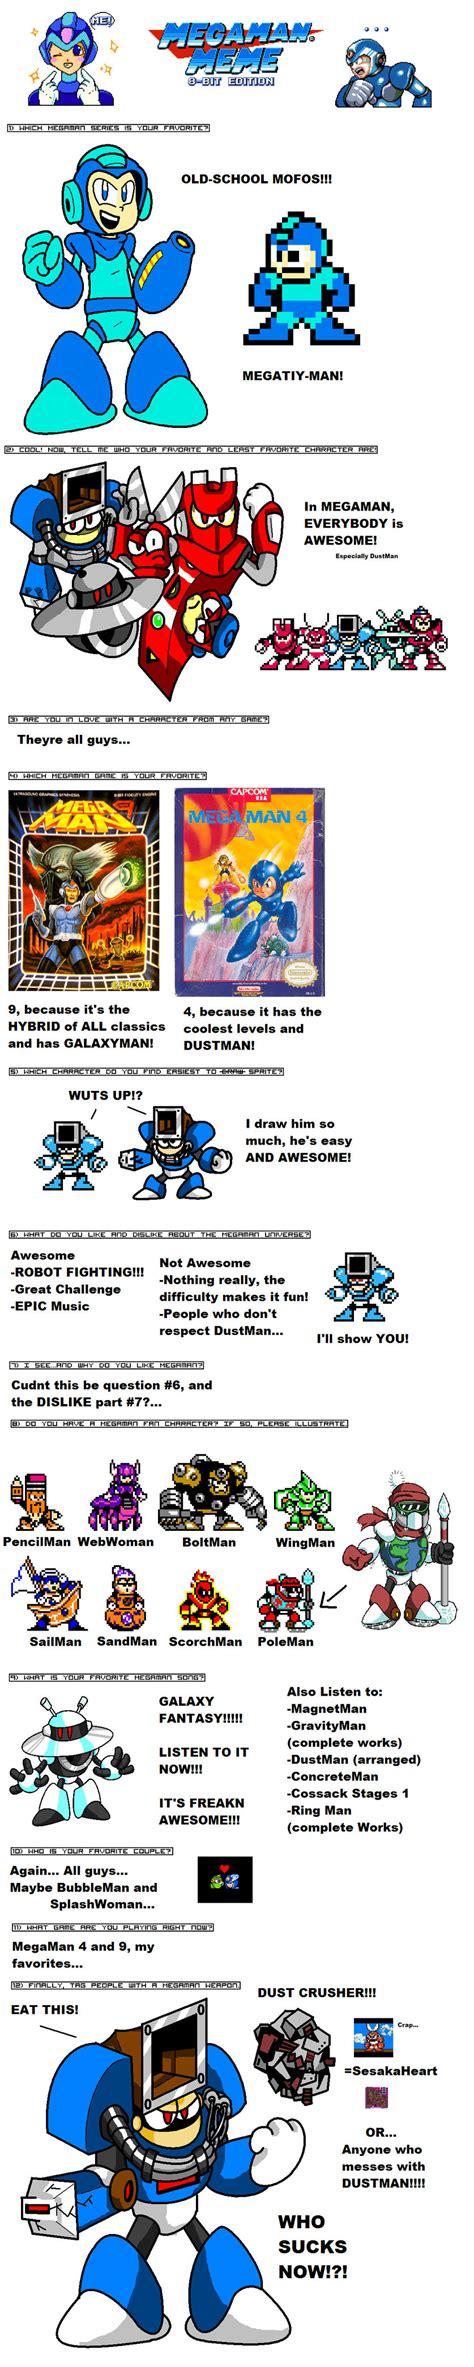 Megaman Memes - marioshi64 megaman meme by marioshi64 on deviantart